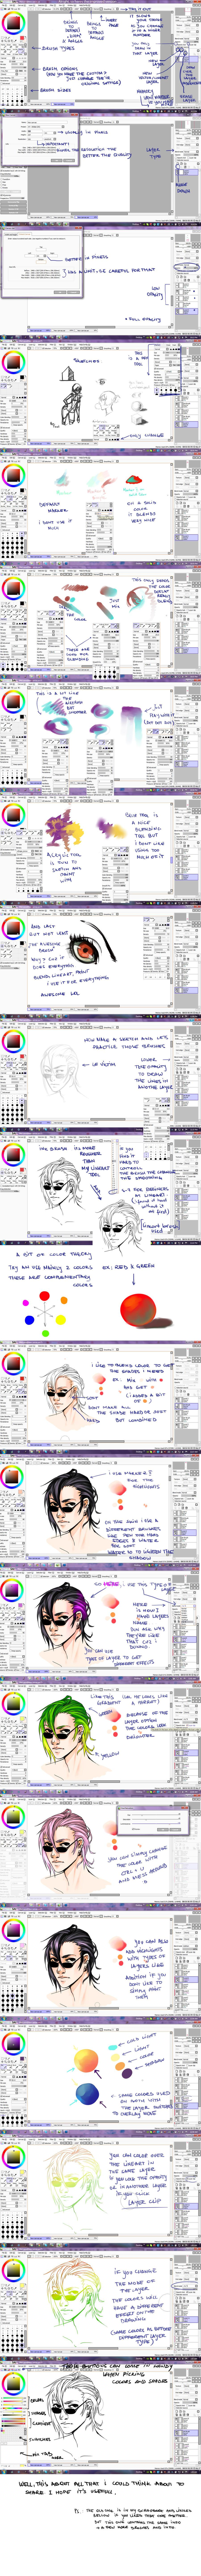 Sai paint tool tutorial by dAiwon